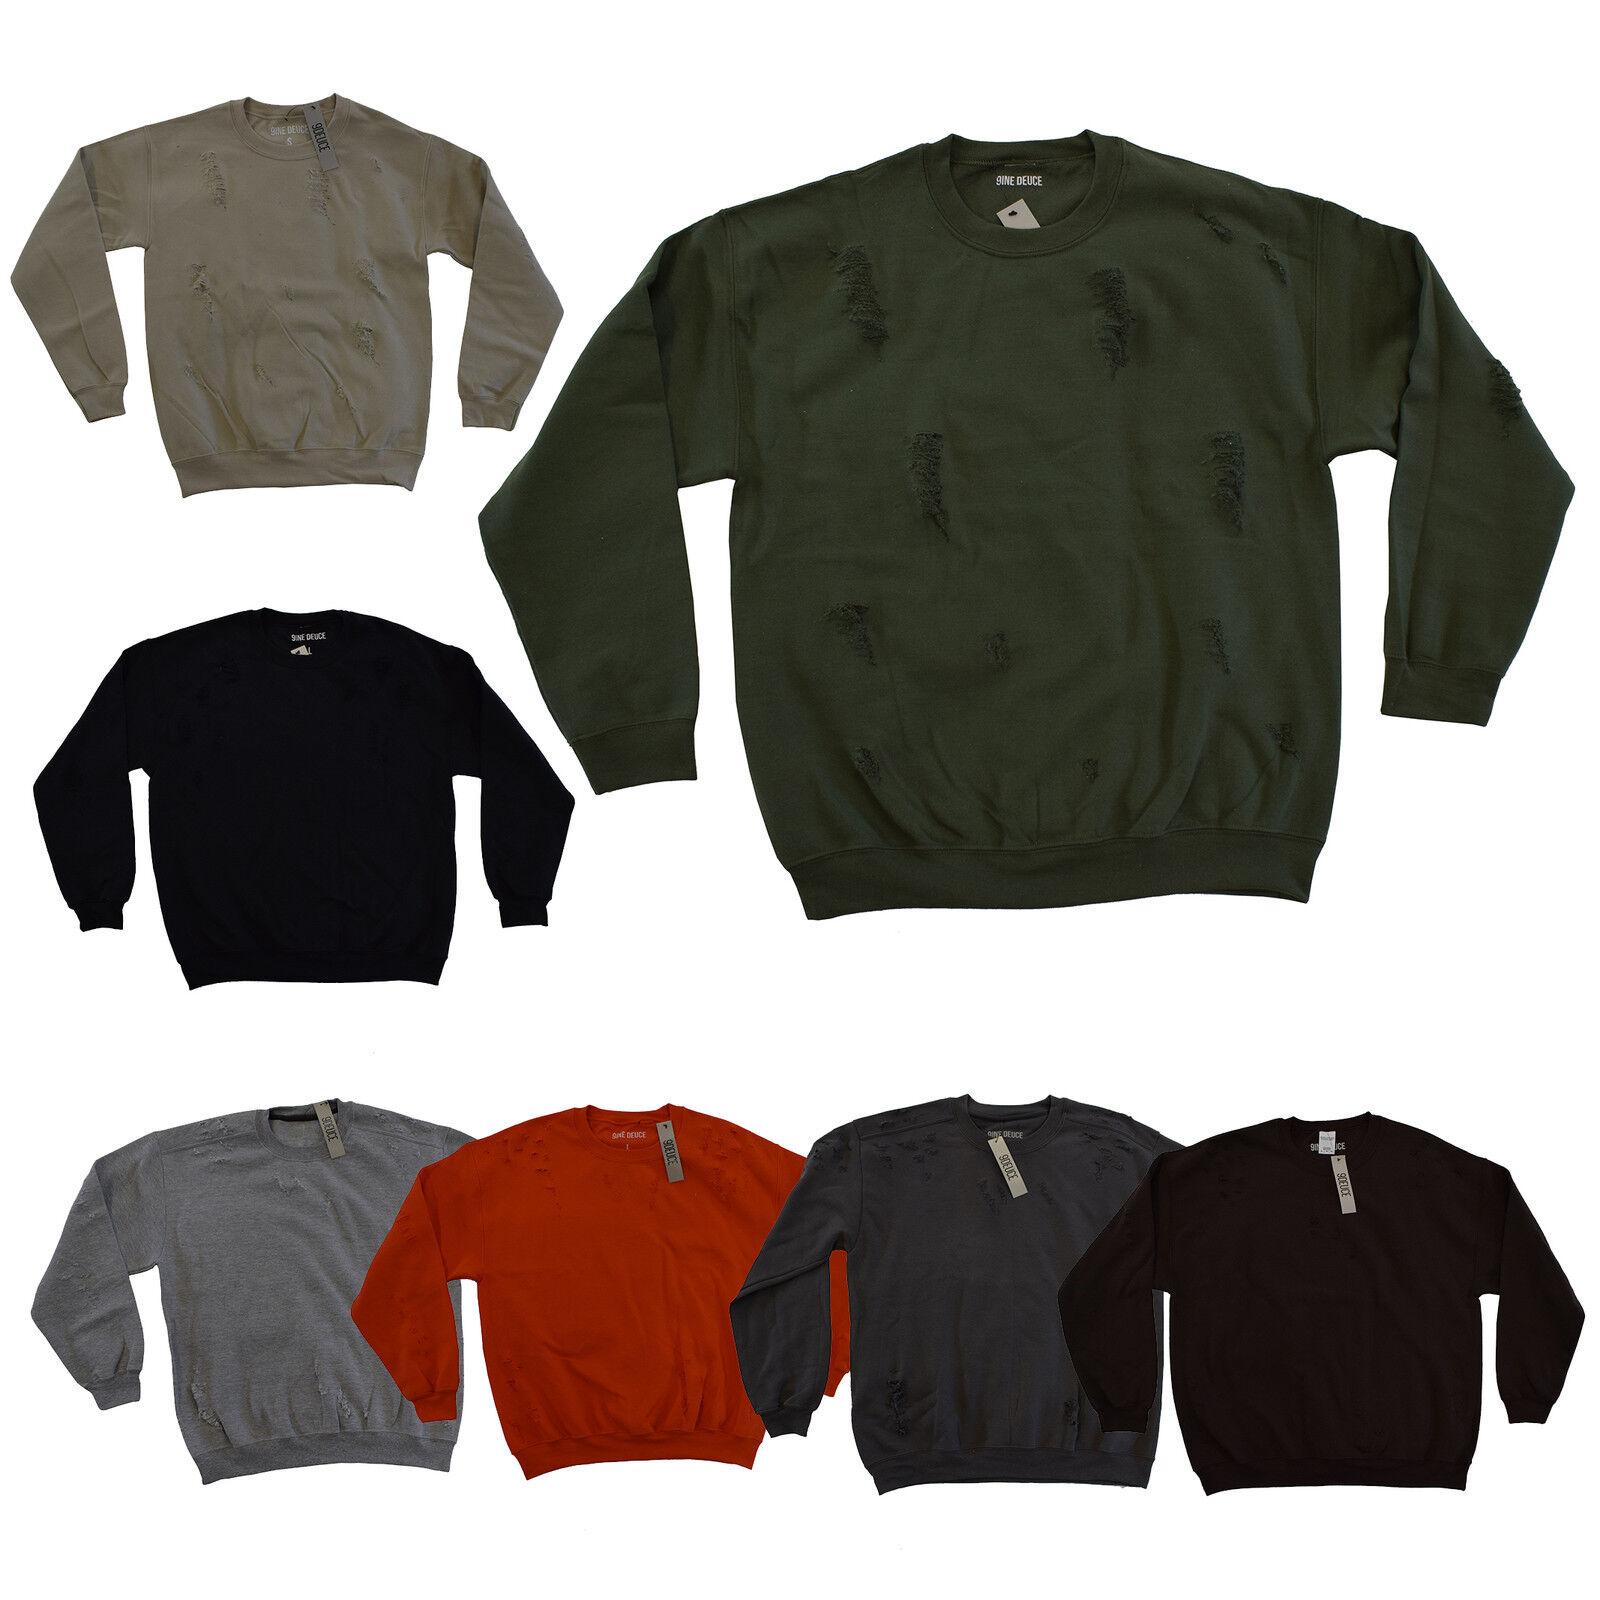 9deuce Custom Distressed Rundhals Sweatshirt TOP